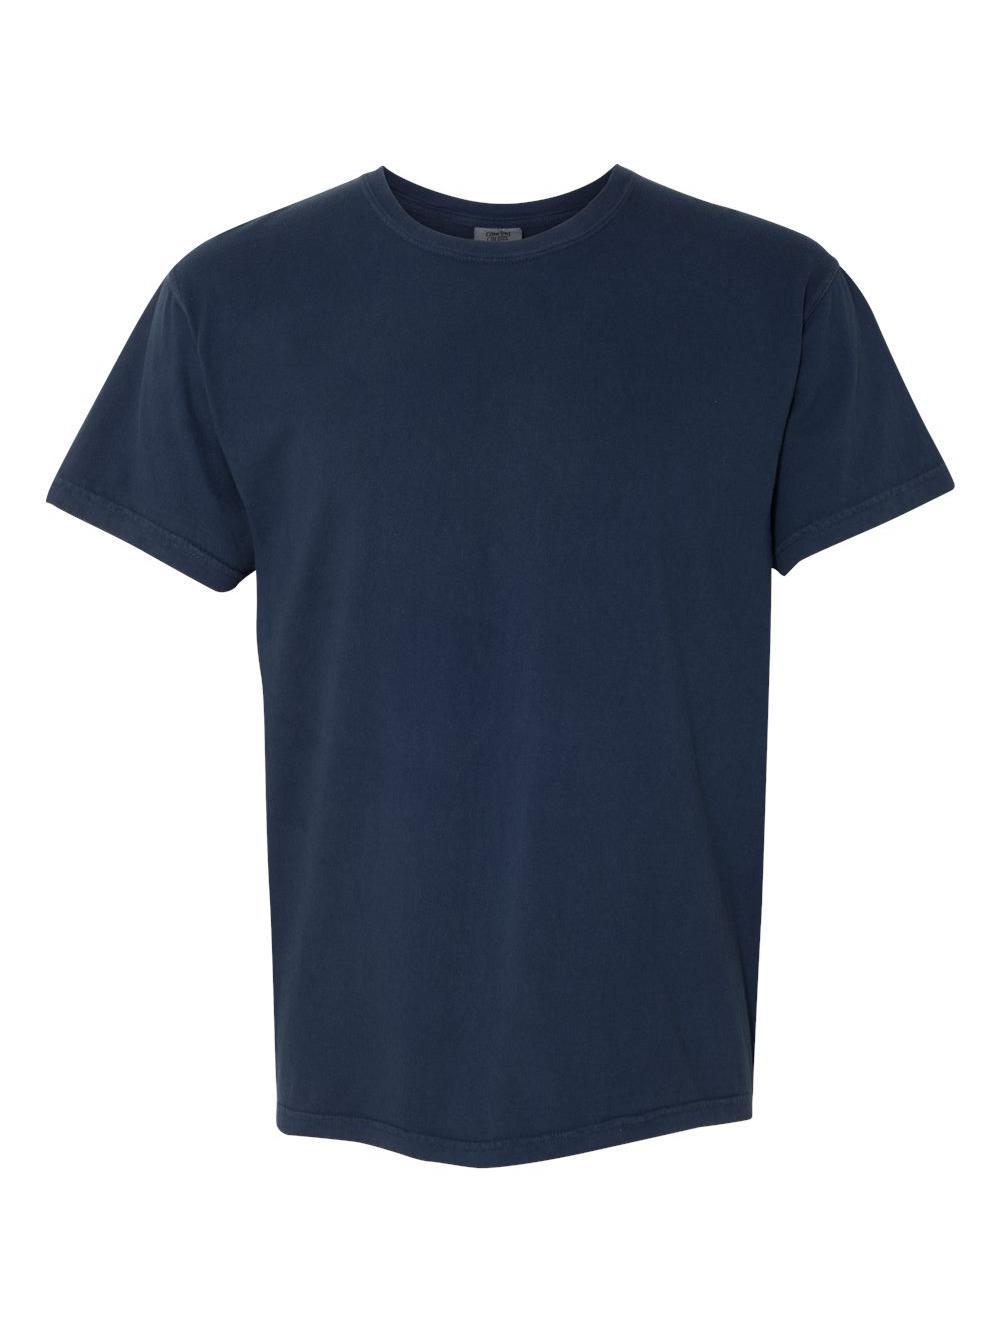 Comfort-Colors-Garment-Dyed-Heavyweight-Ringspun-Short-Sleeve-Shirt-1717 thumbnail 120